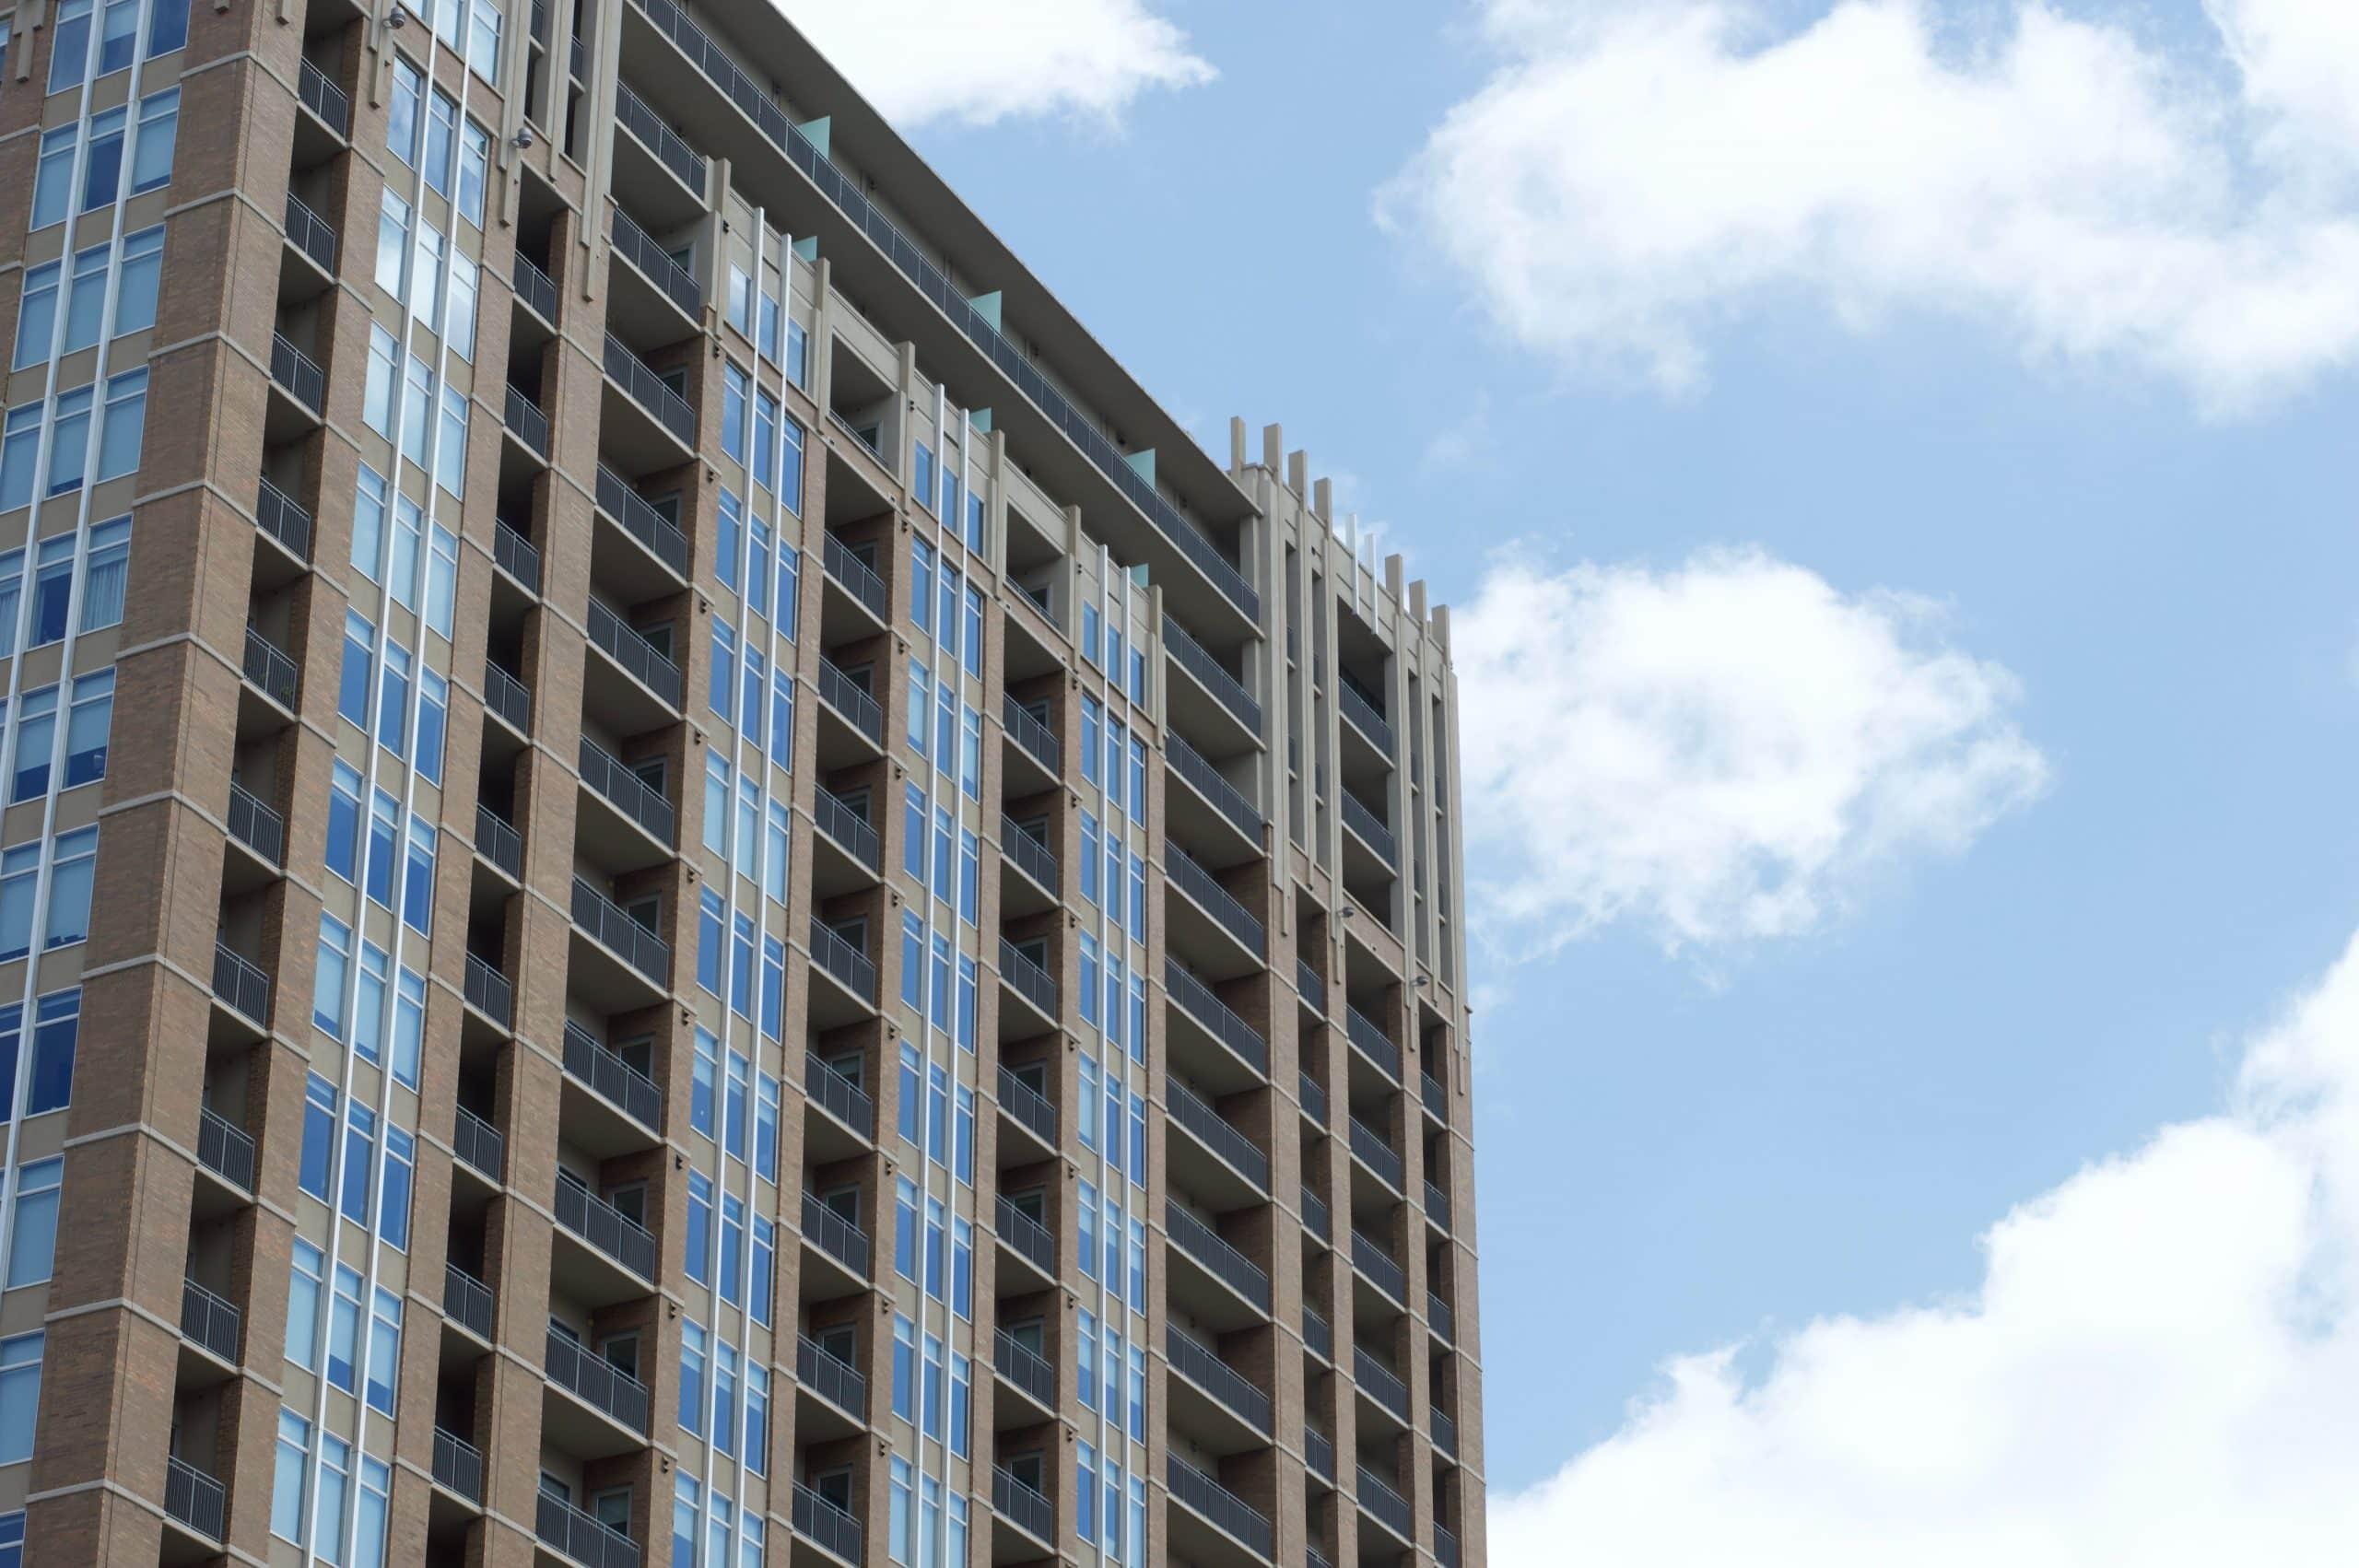 façade d'un immeuble d'habitations